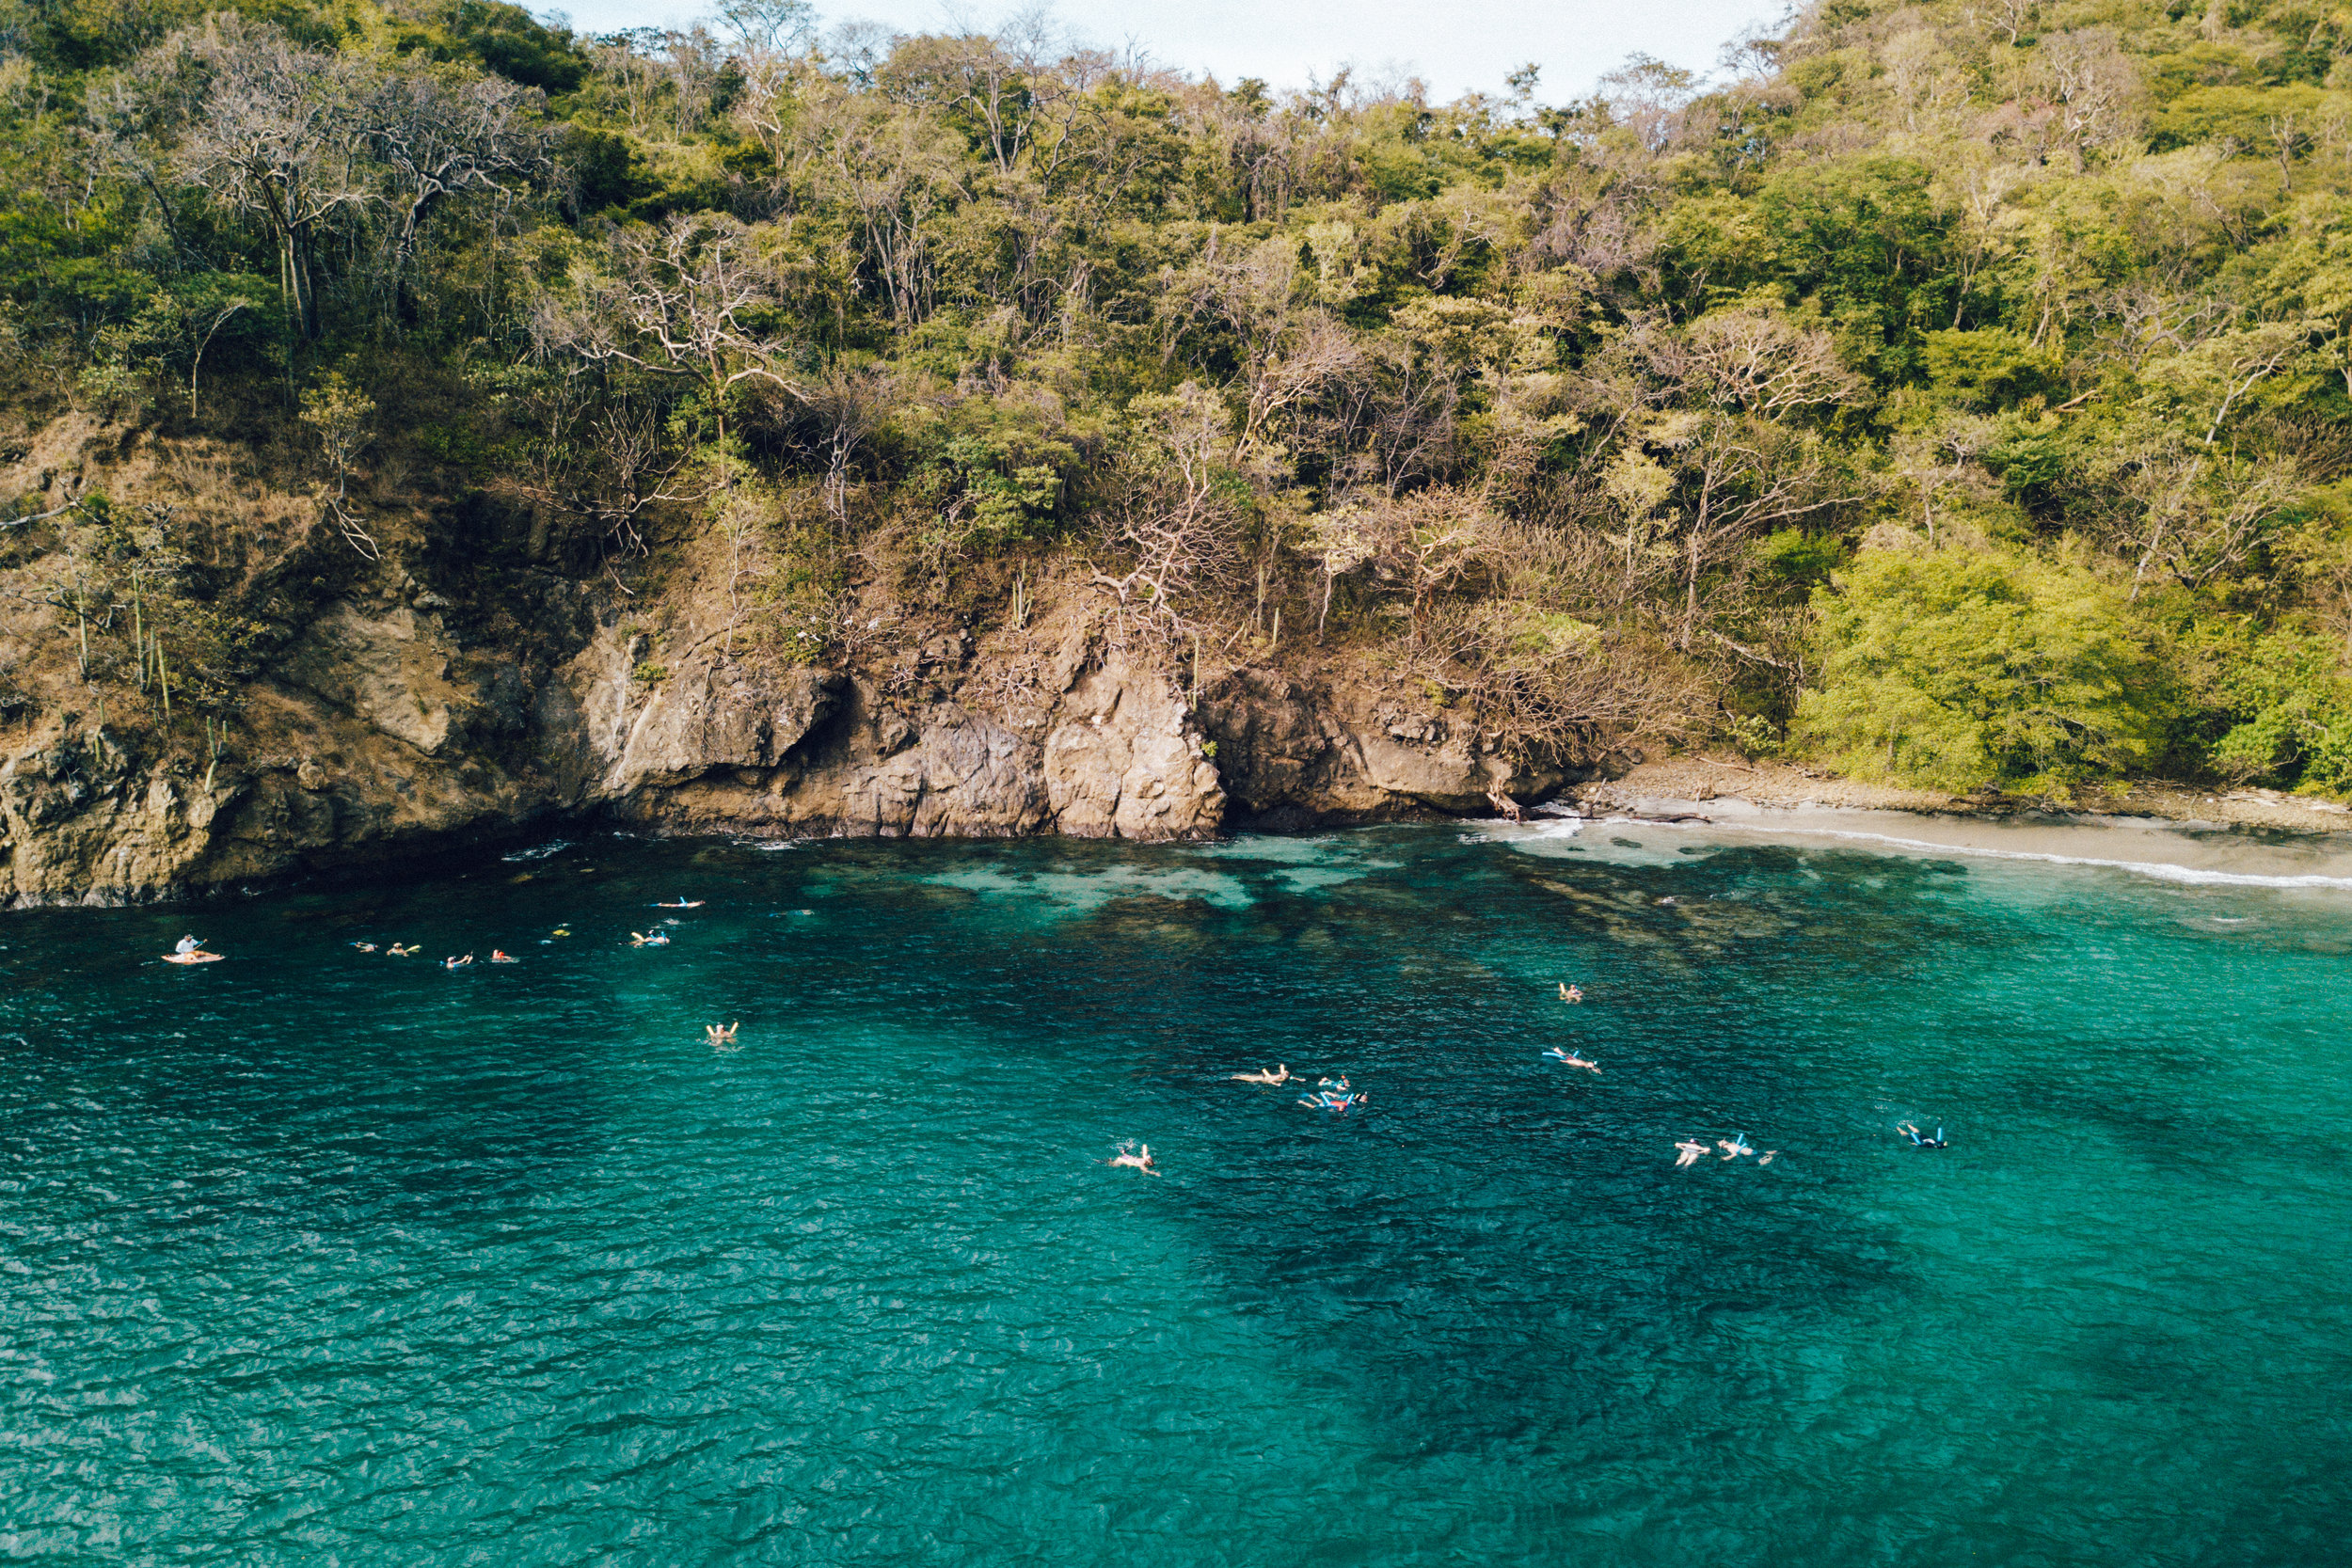 Costa_Rica_20180103_186.jpg